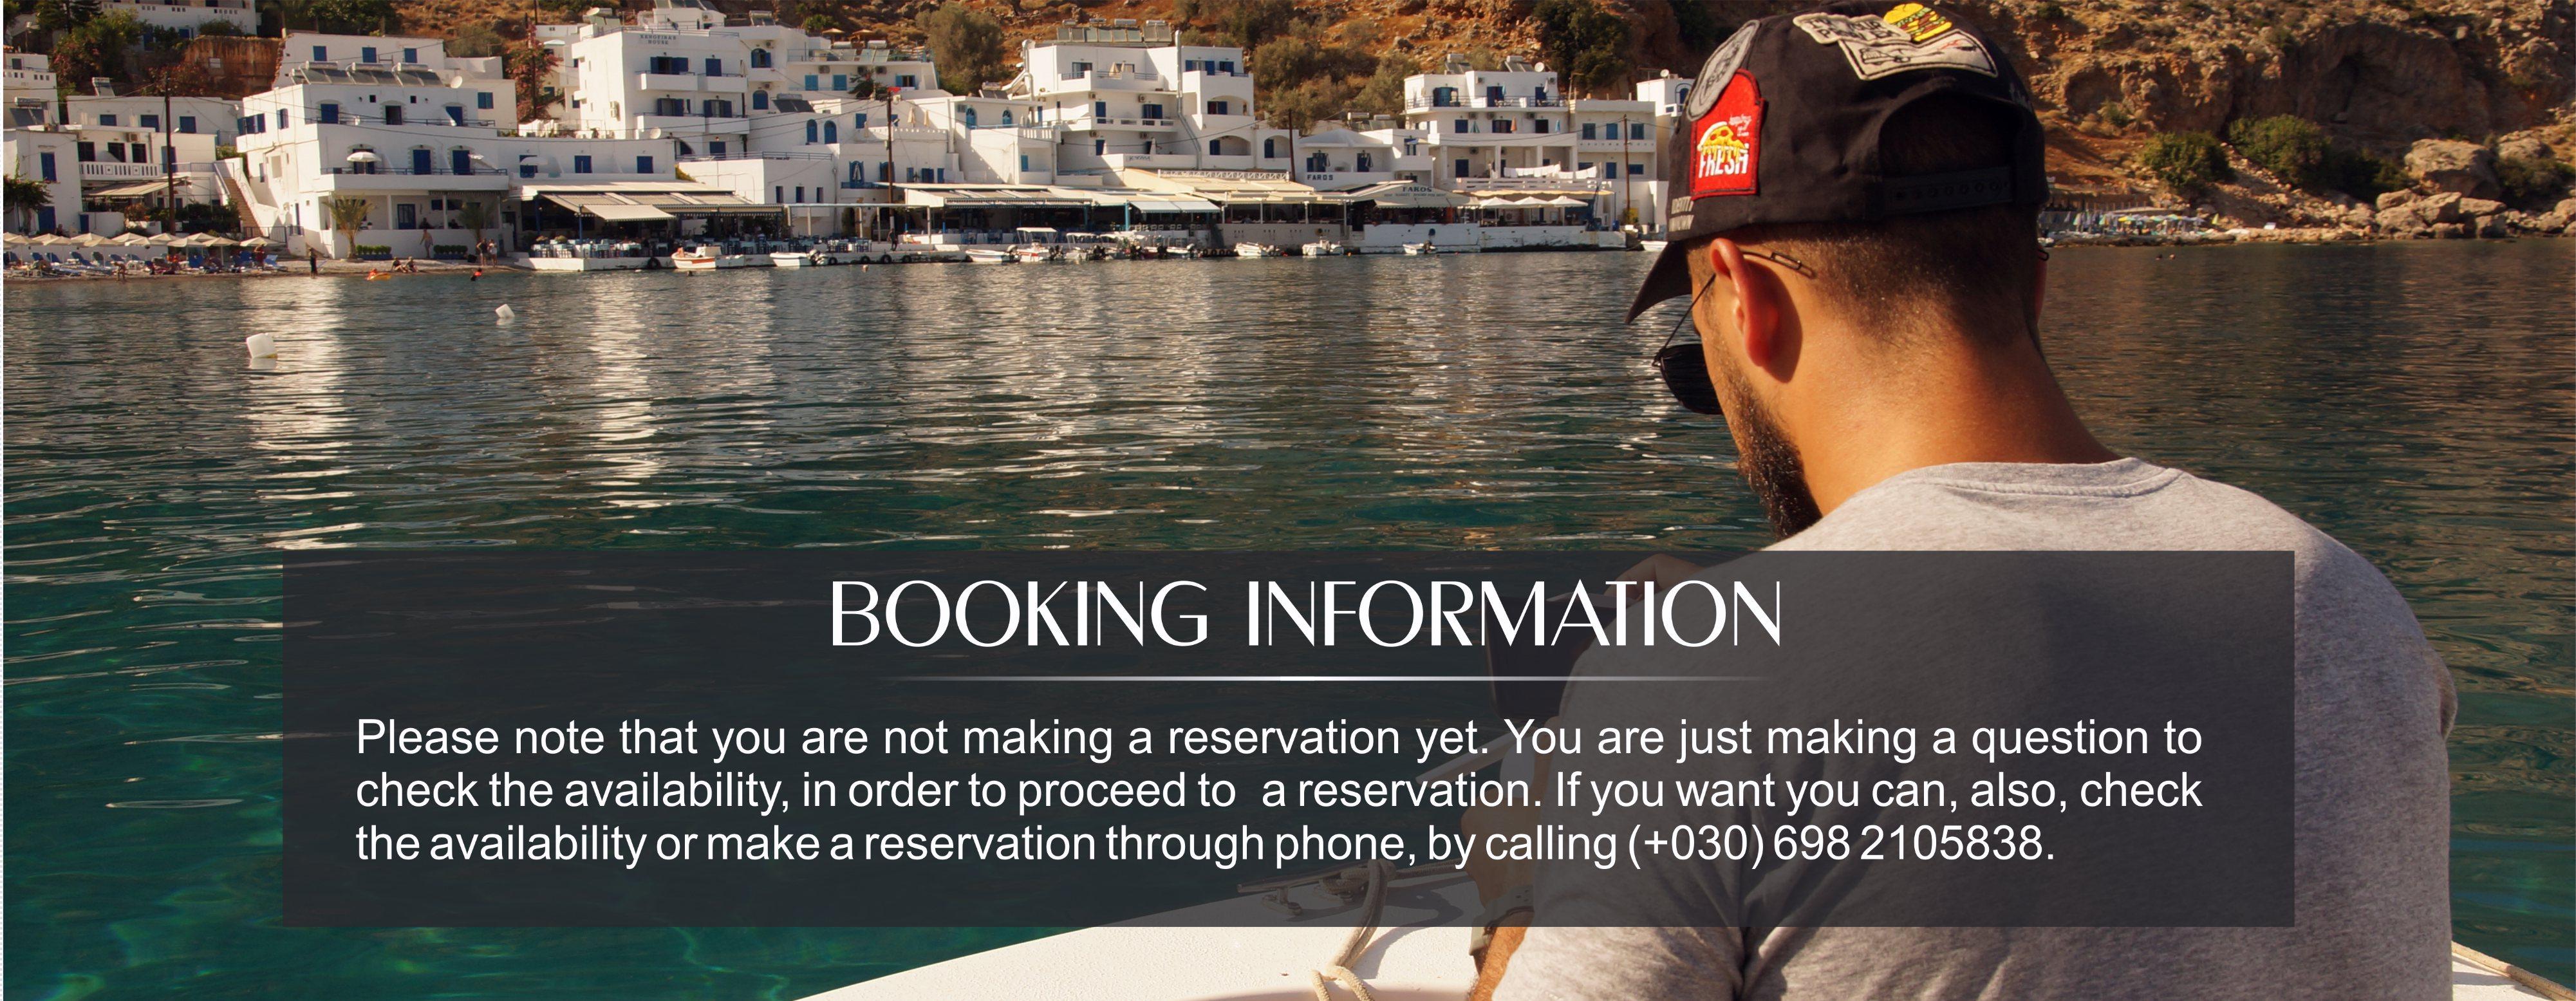 booking_wallpaper_978kb